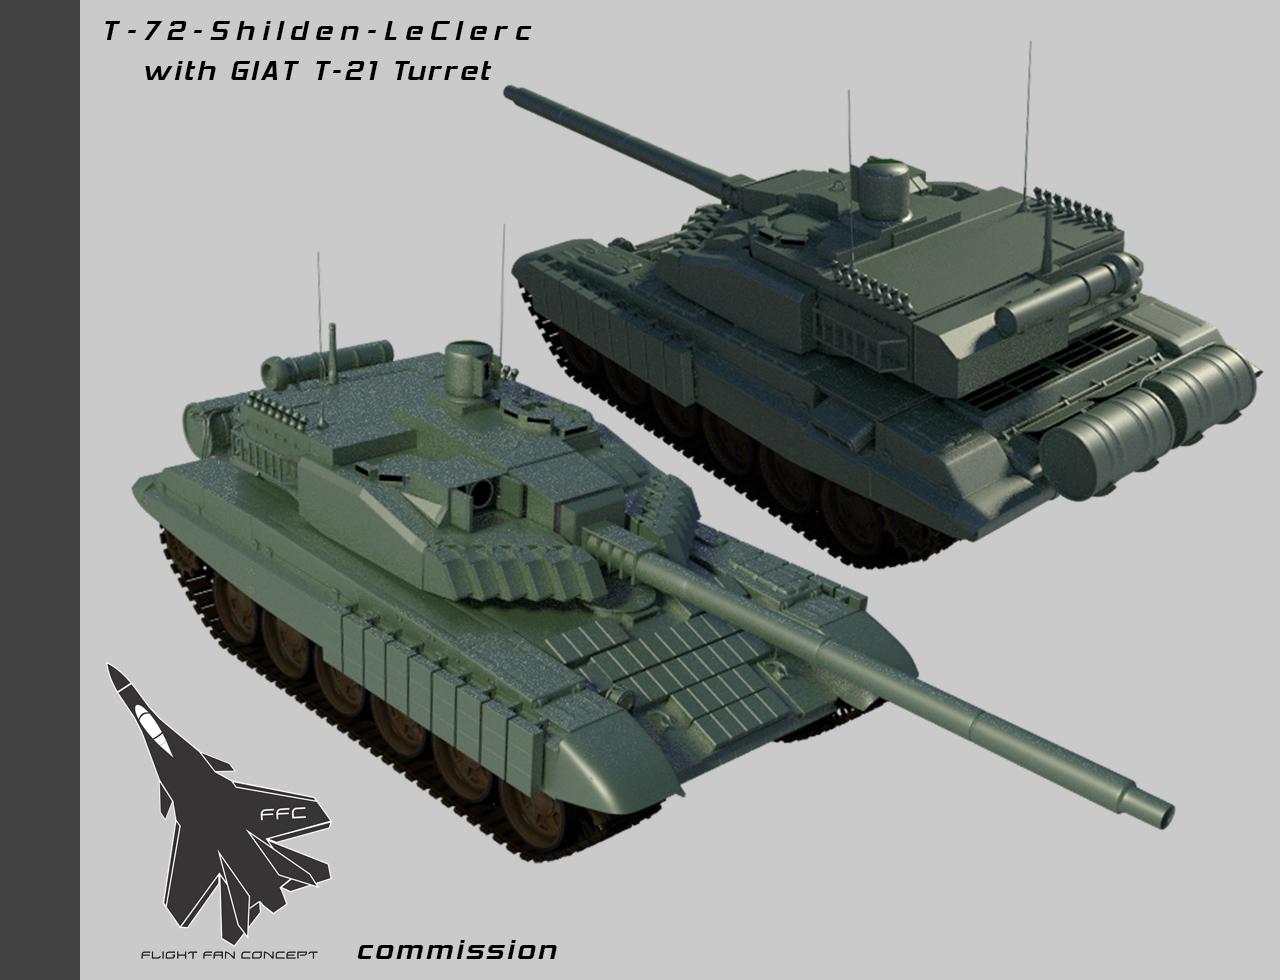 leclerc tank vs leopard 2 images galleries with a bite. Black Bedroom Furniture Sets. Home Design Ideas